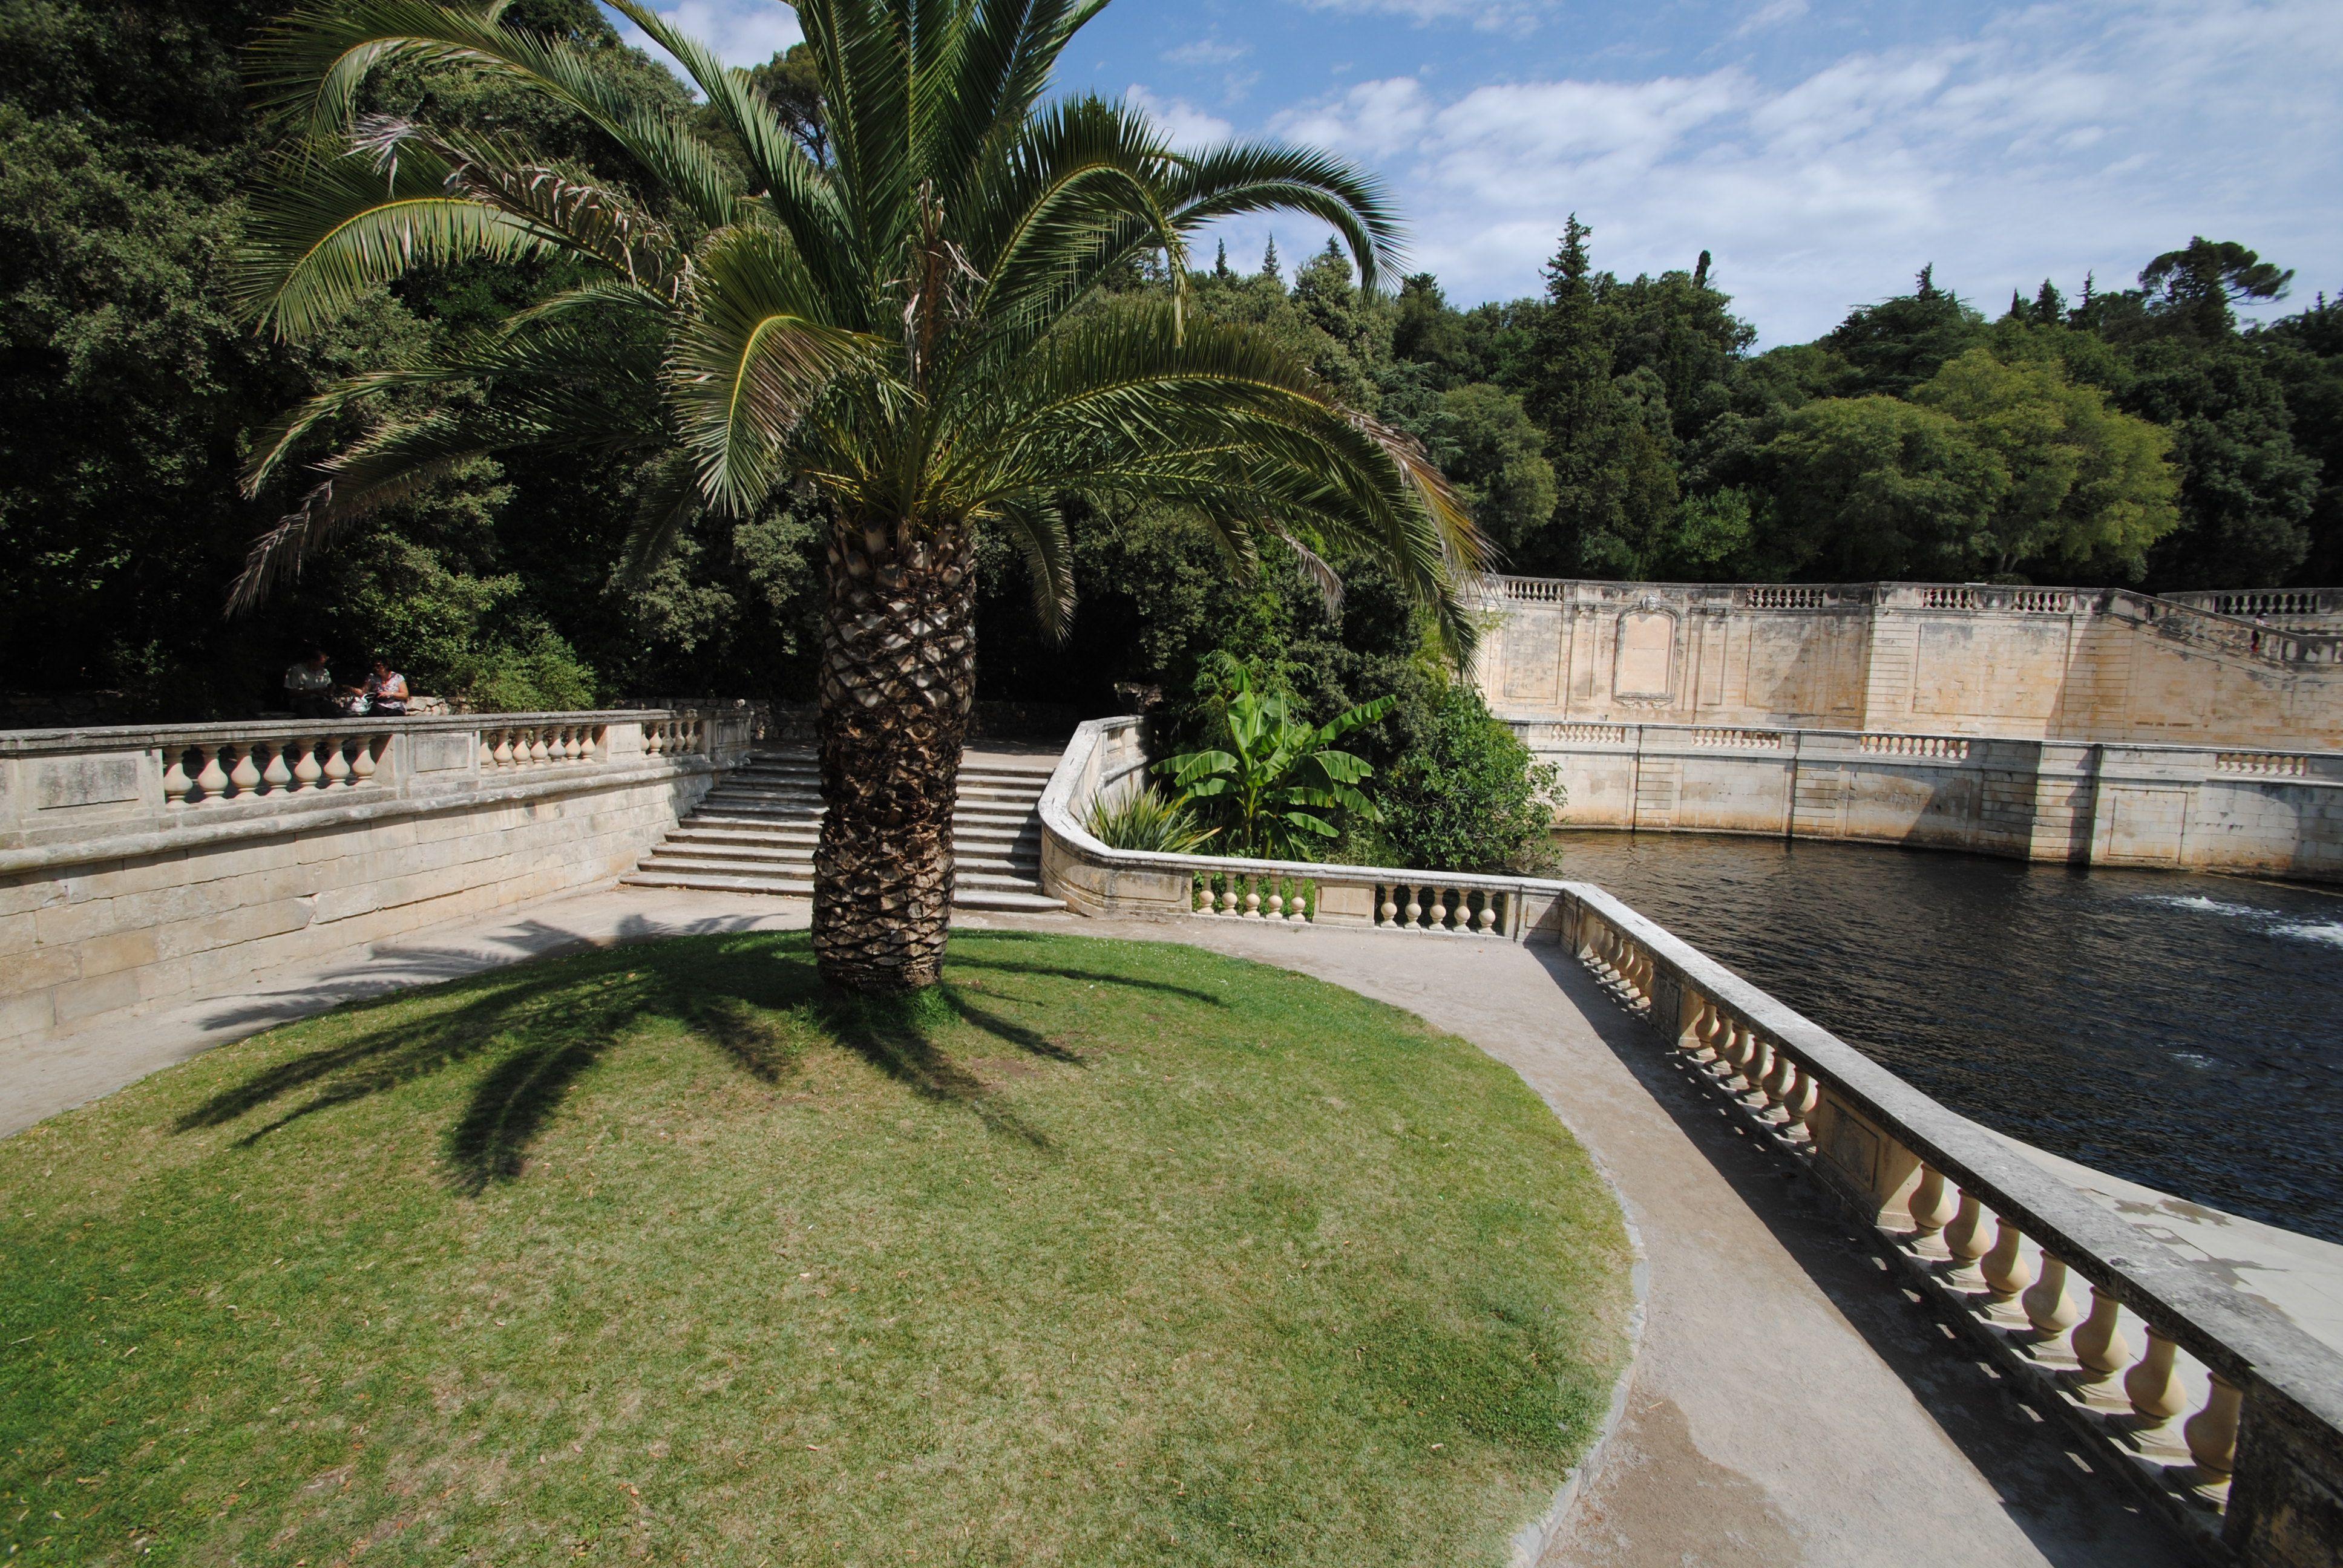 Les Jardins De La Fontaine Nimes Nimes Pinterest Jardins De La